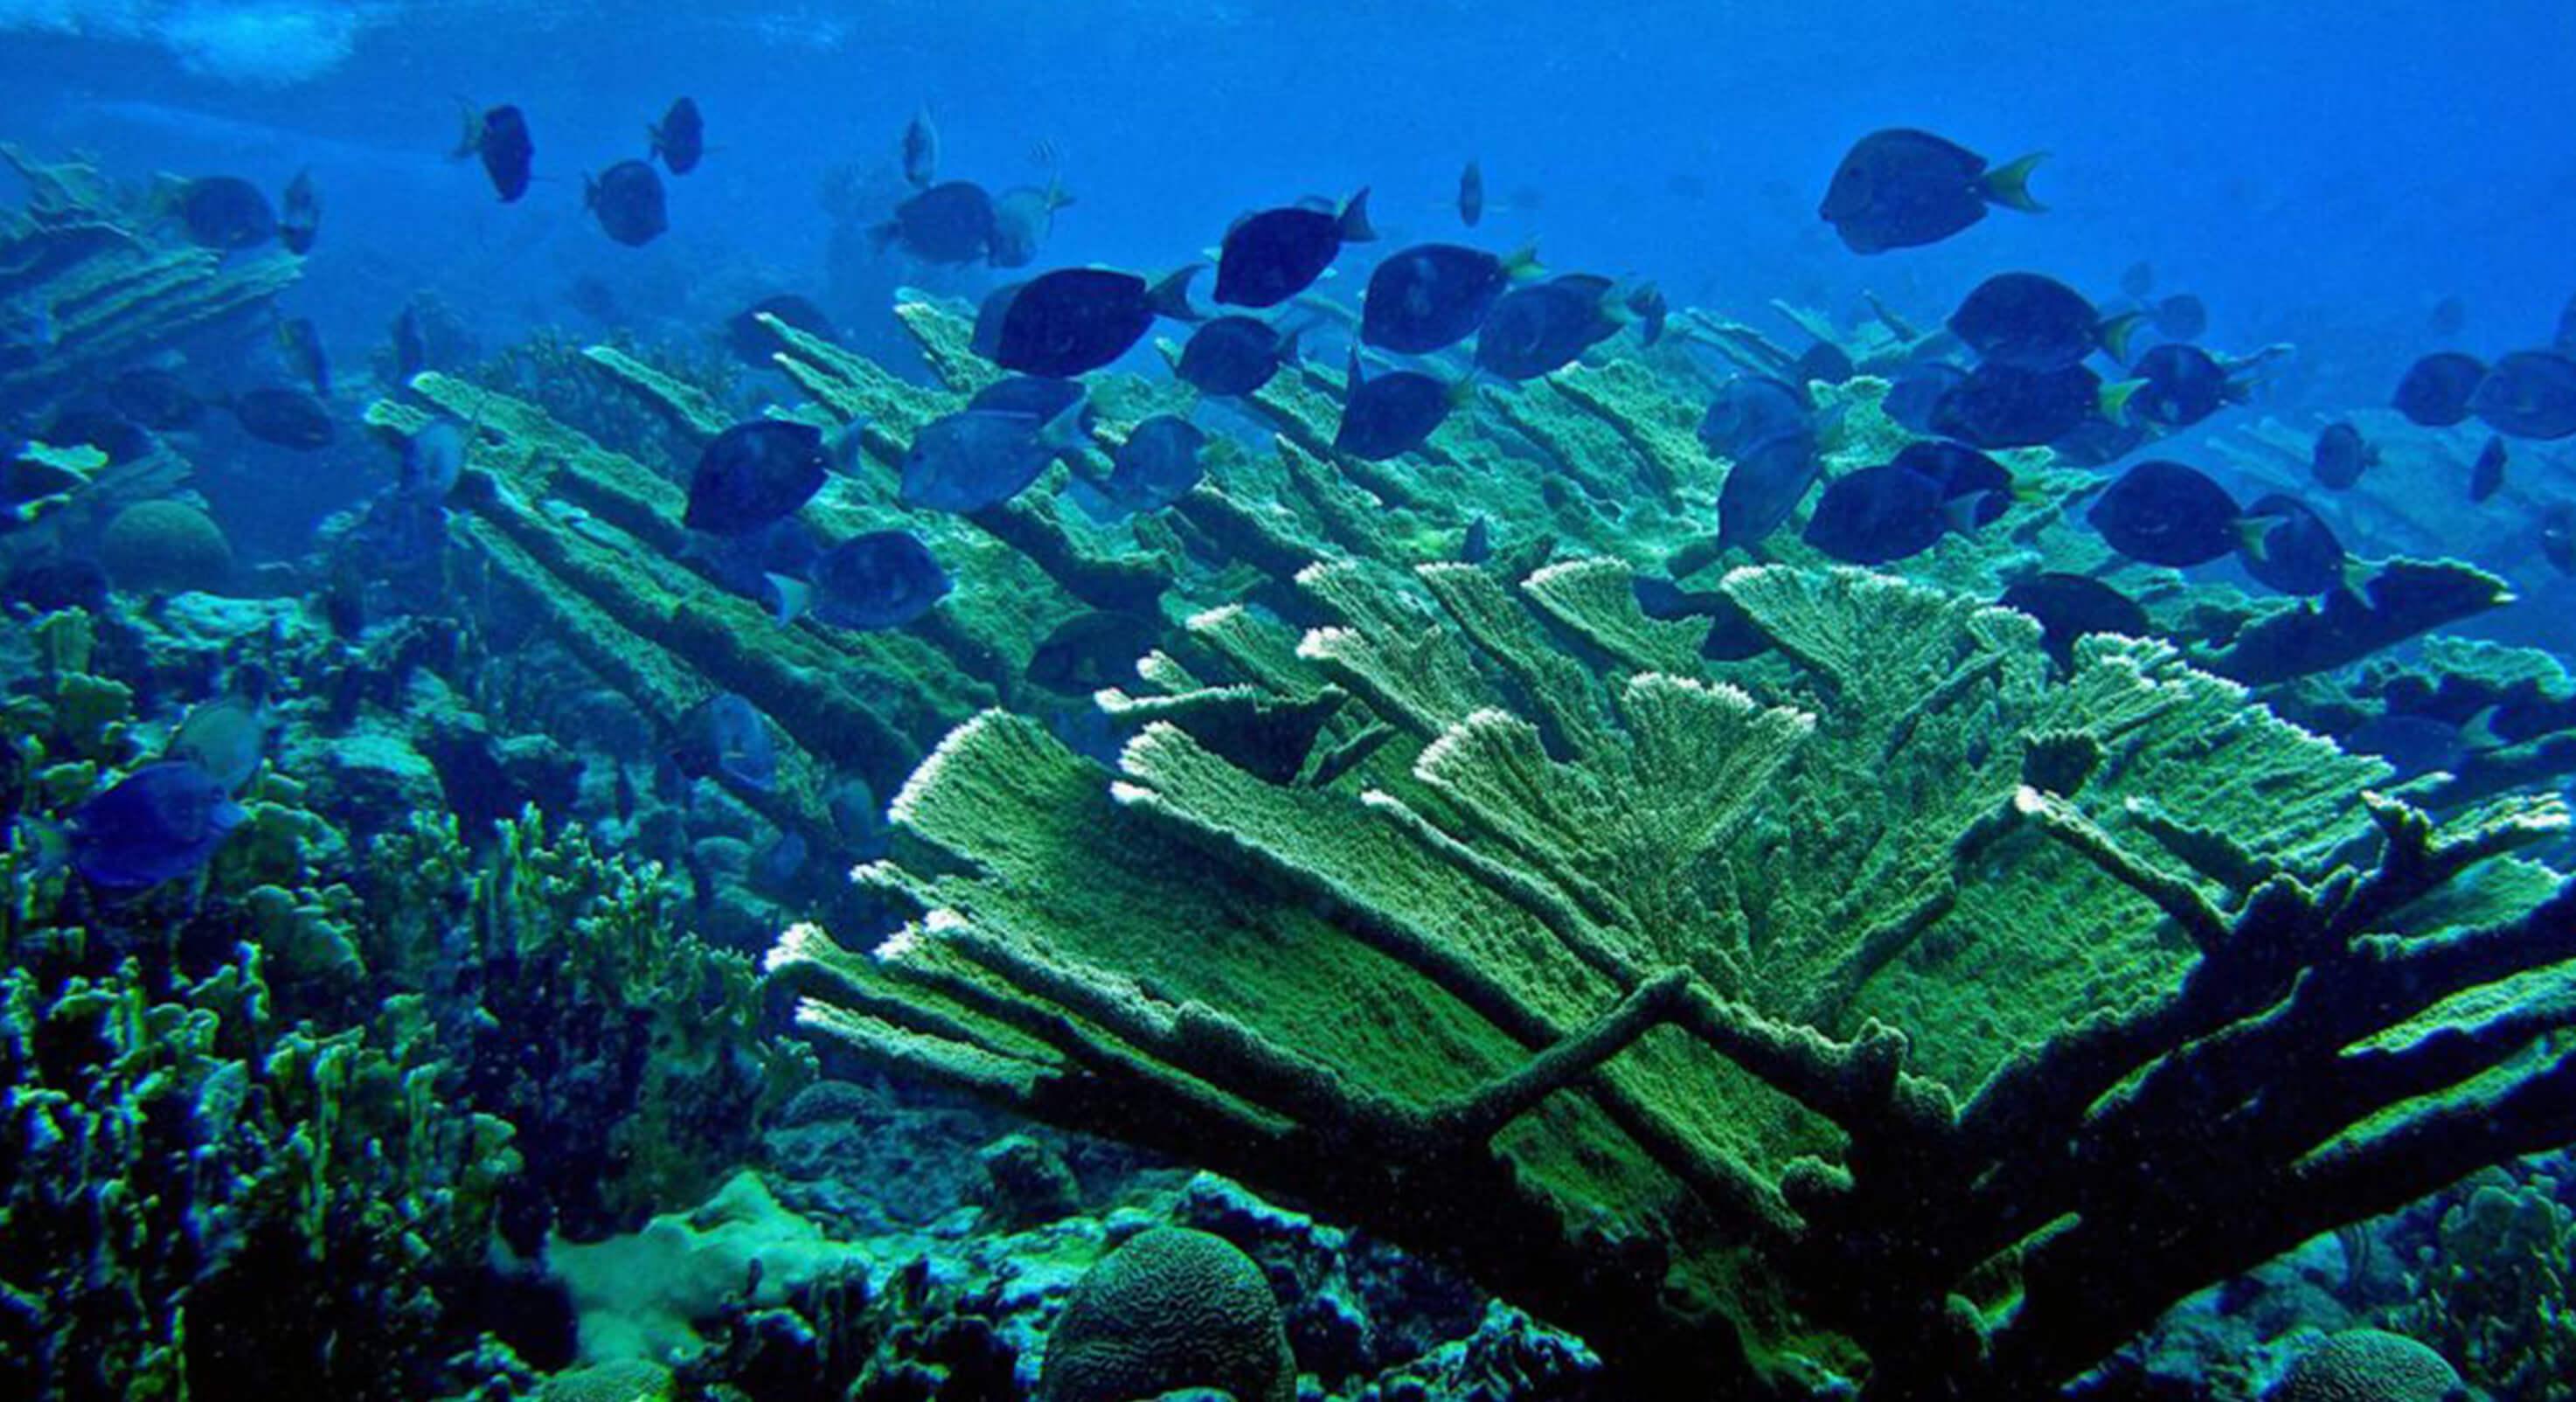 Steneck-corals-news-feature-1024x578-1-1